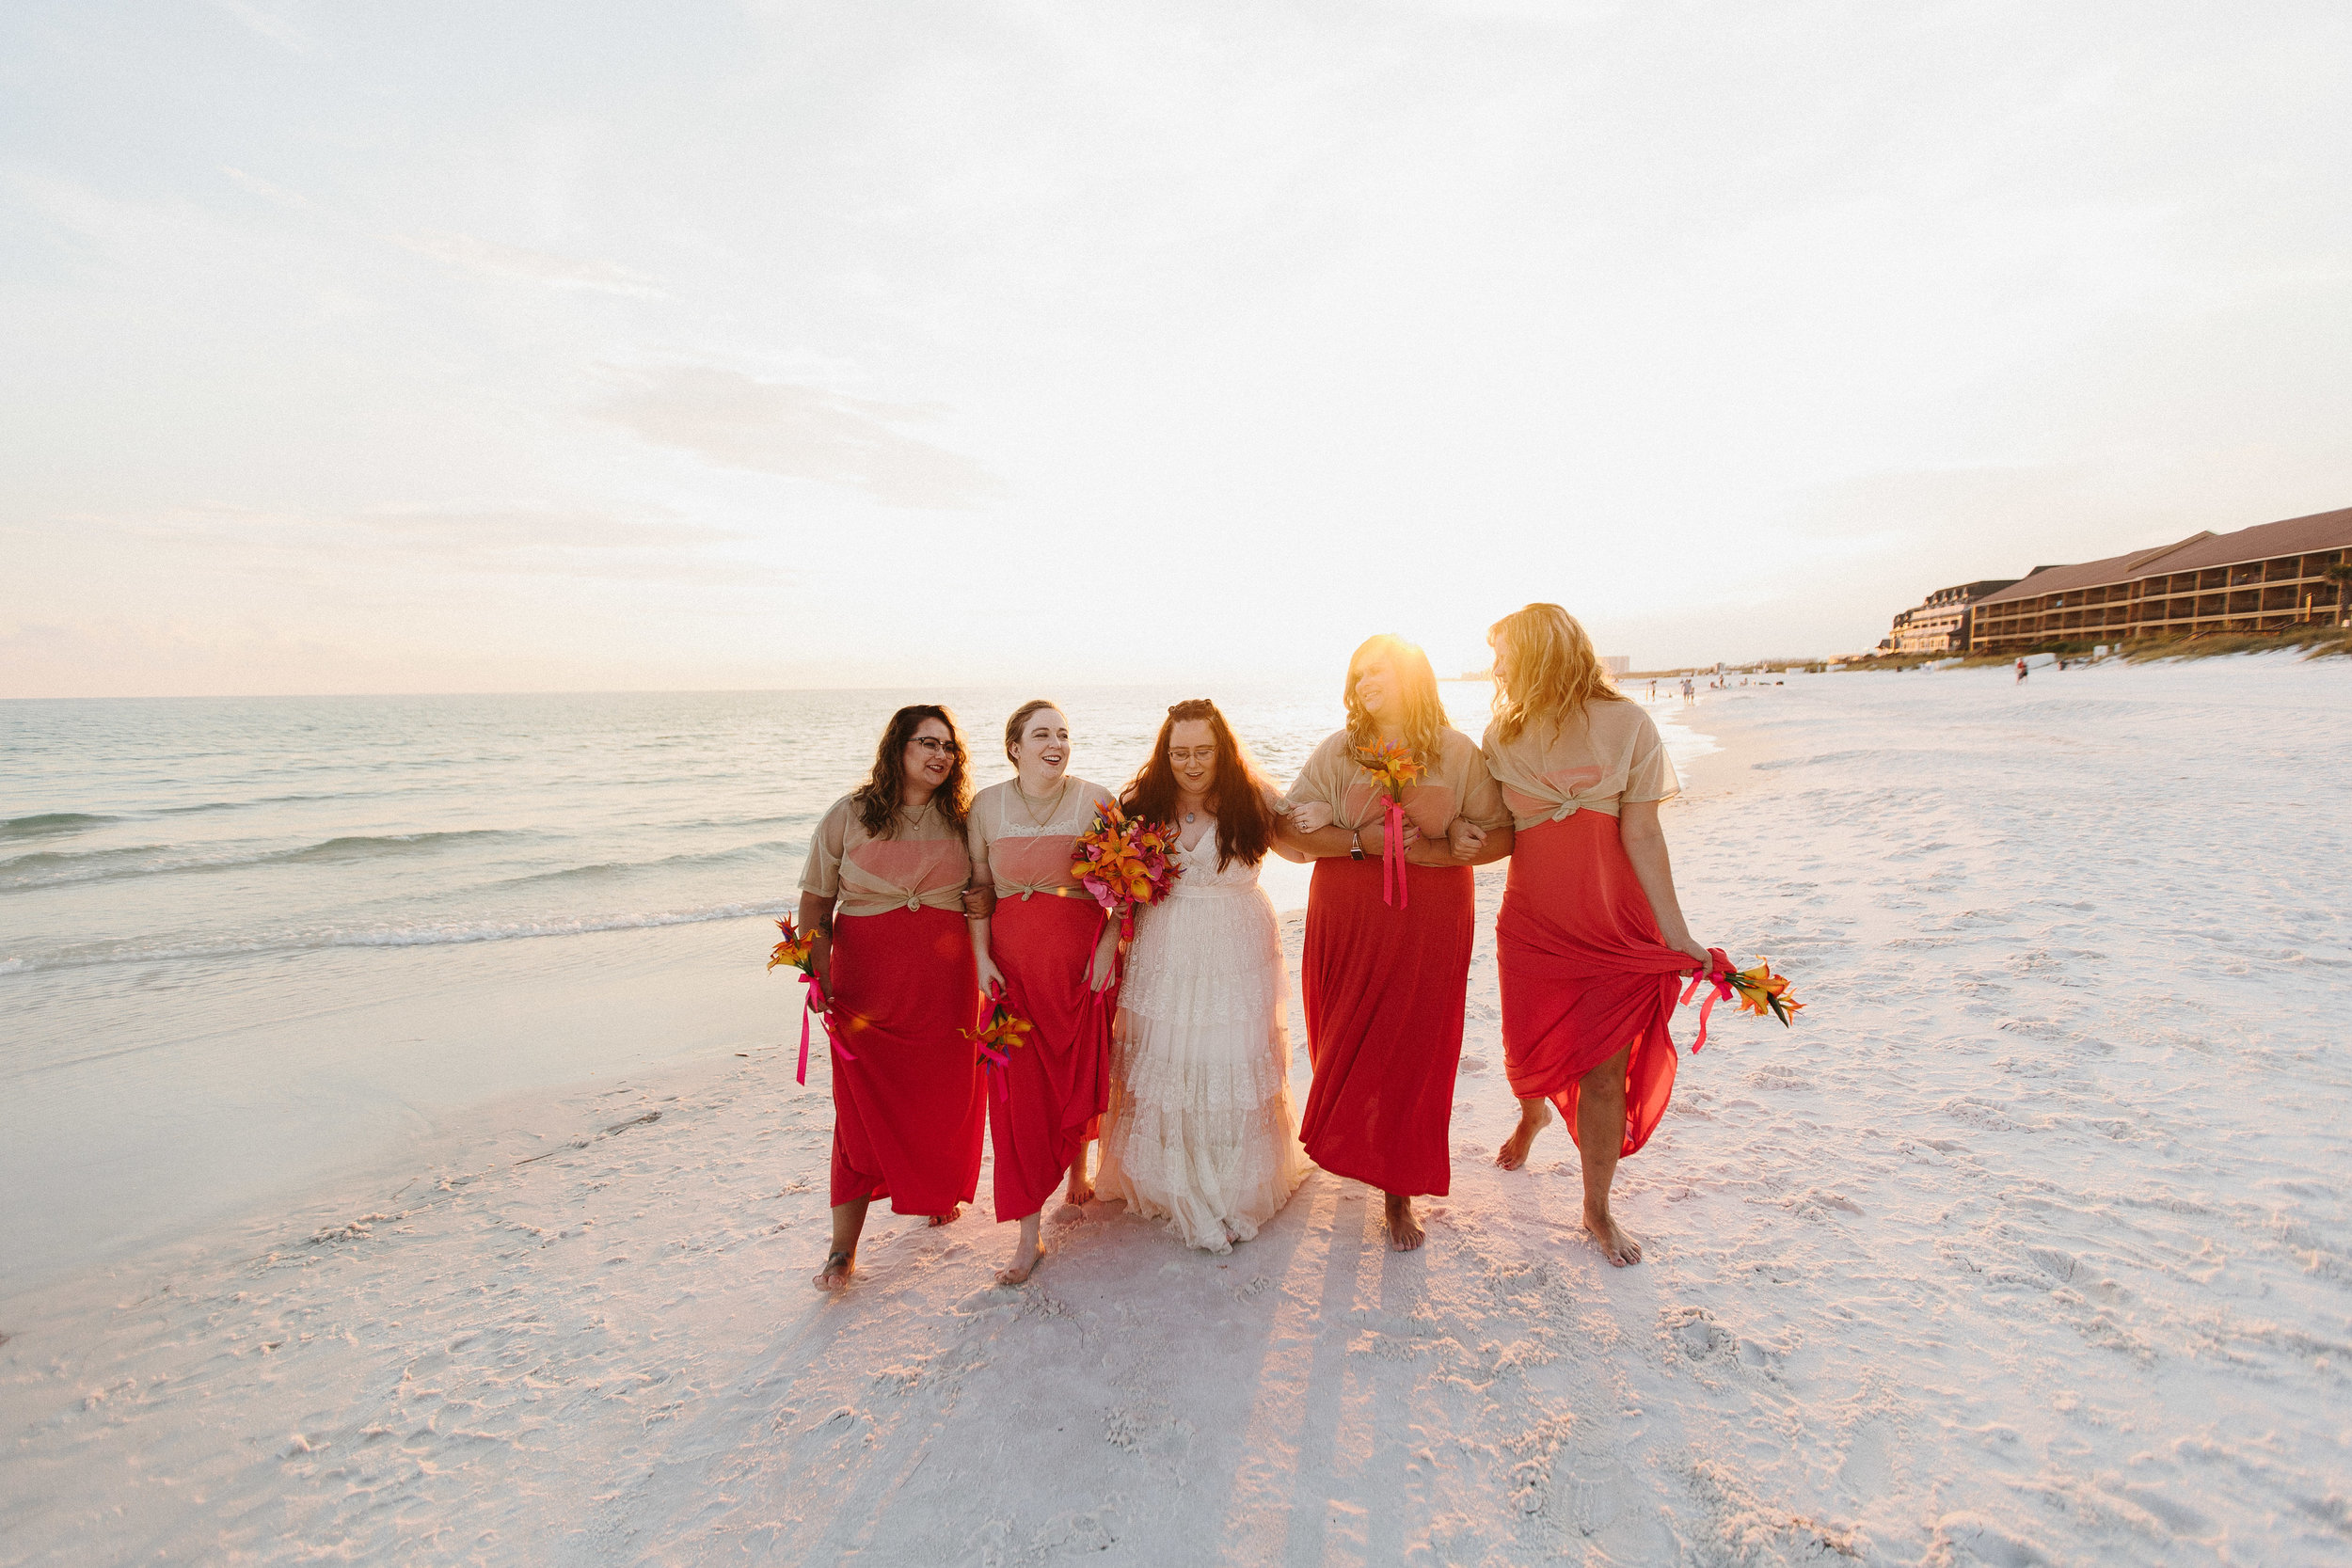 destin_sunset_beach_elopement_intimate_wedding_photographer_florida_documentary_1298.jpg